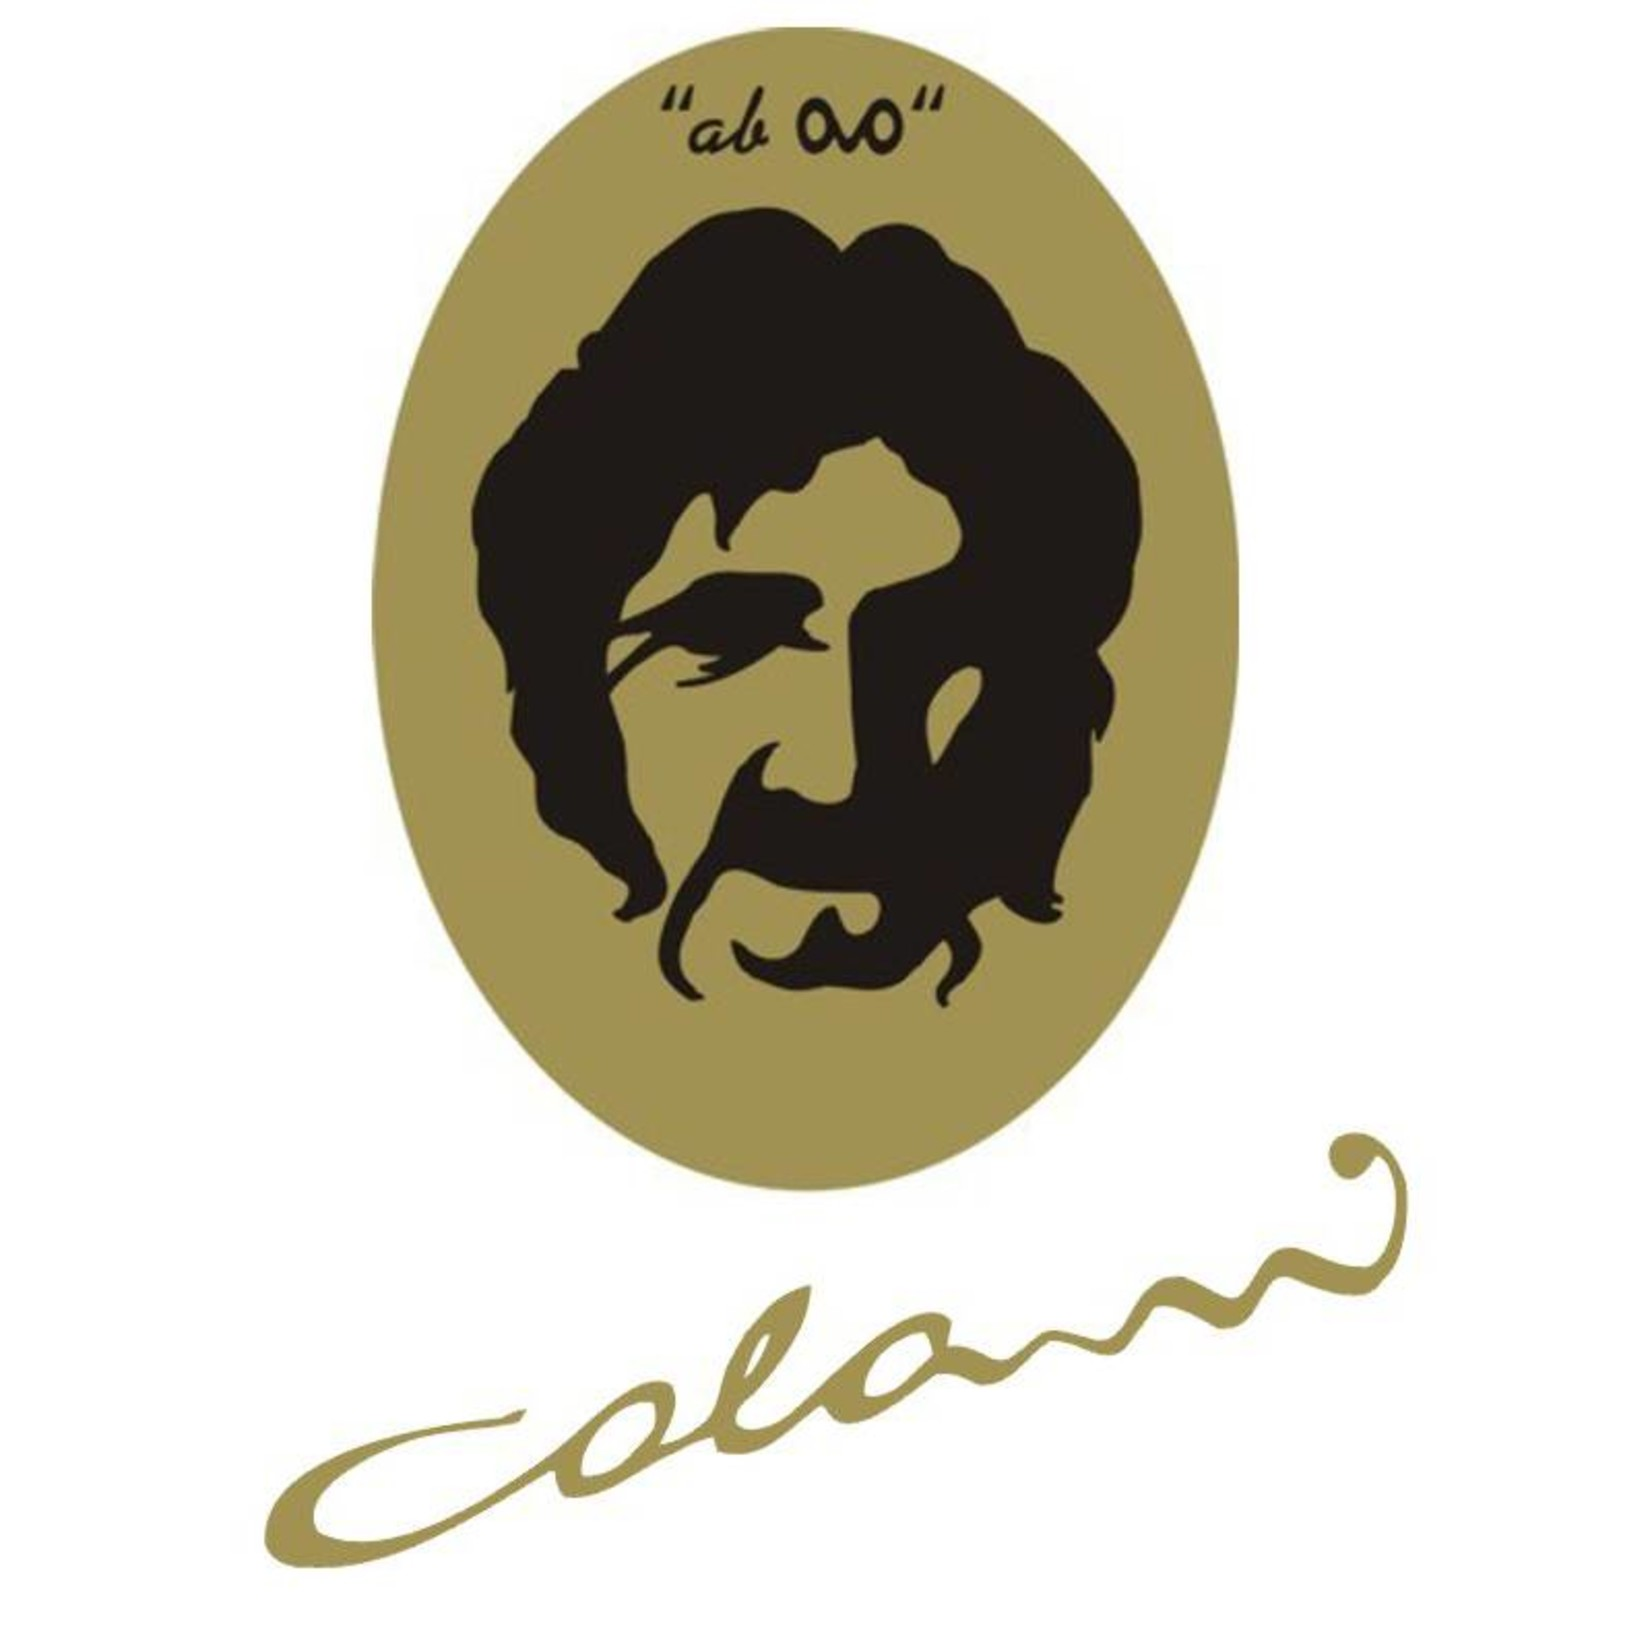 Colani Porzellanserie Colani Dessertteller | blau | Frühstücksteller | Luigi Colani Design